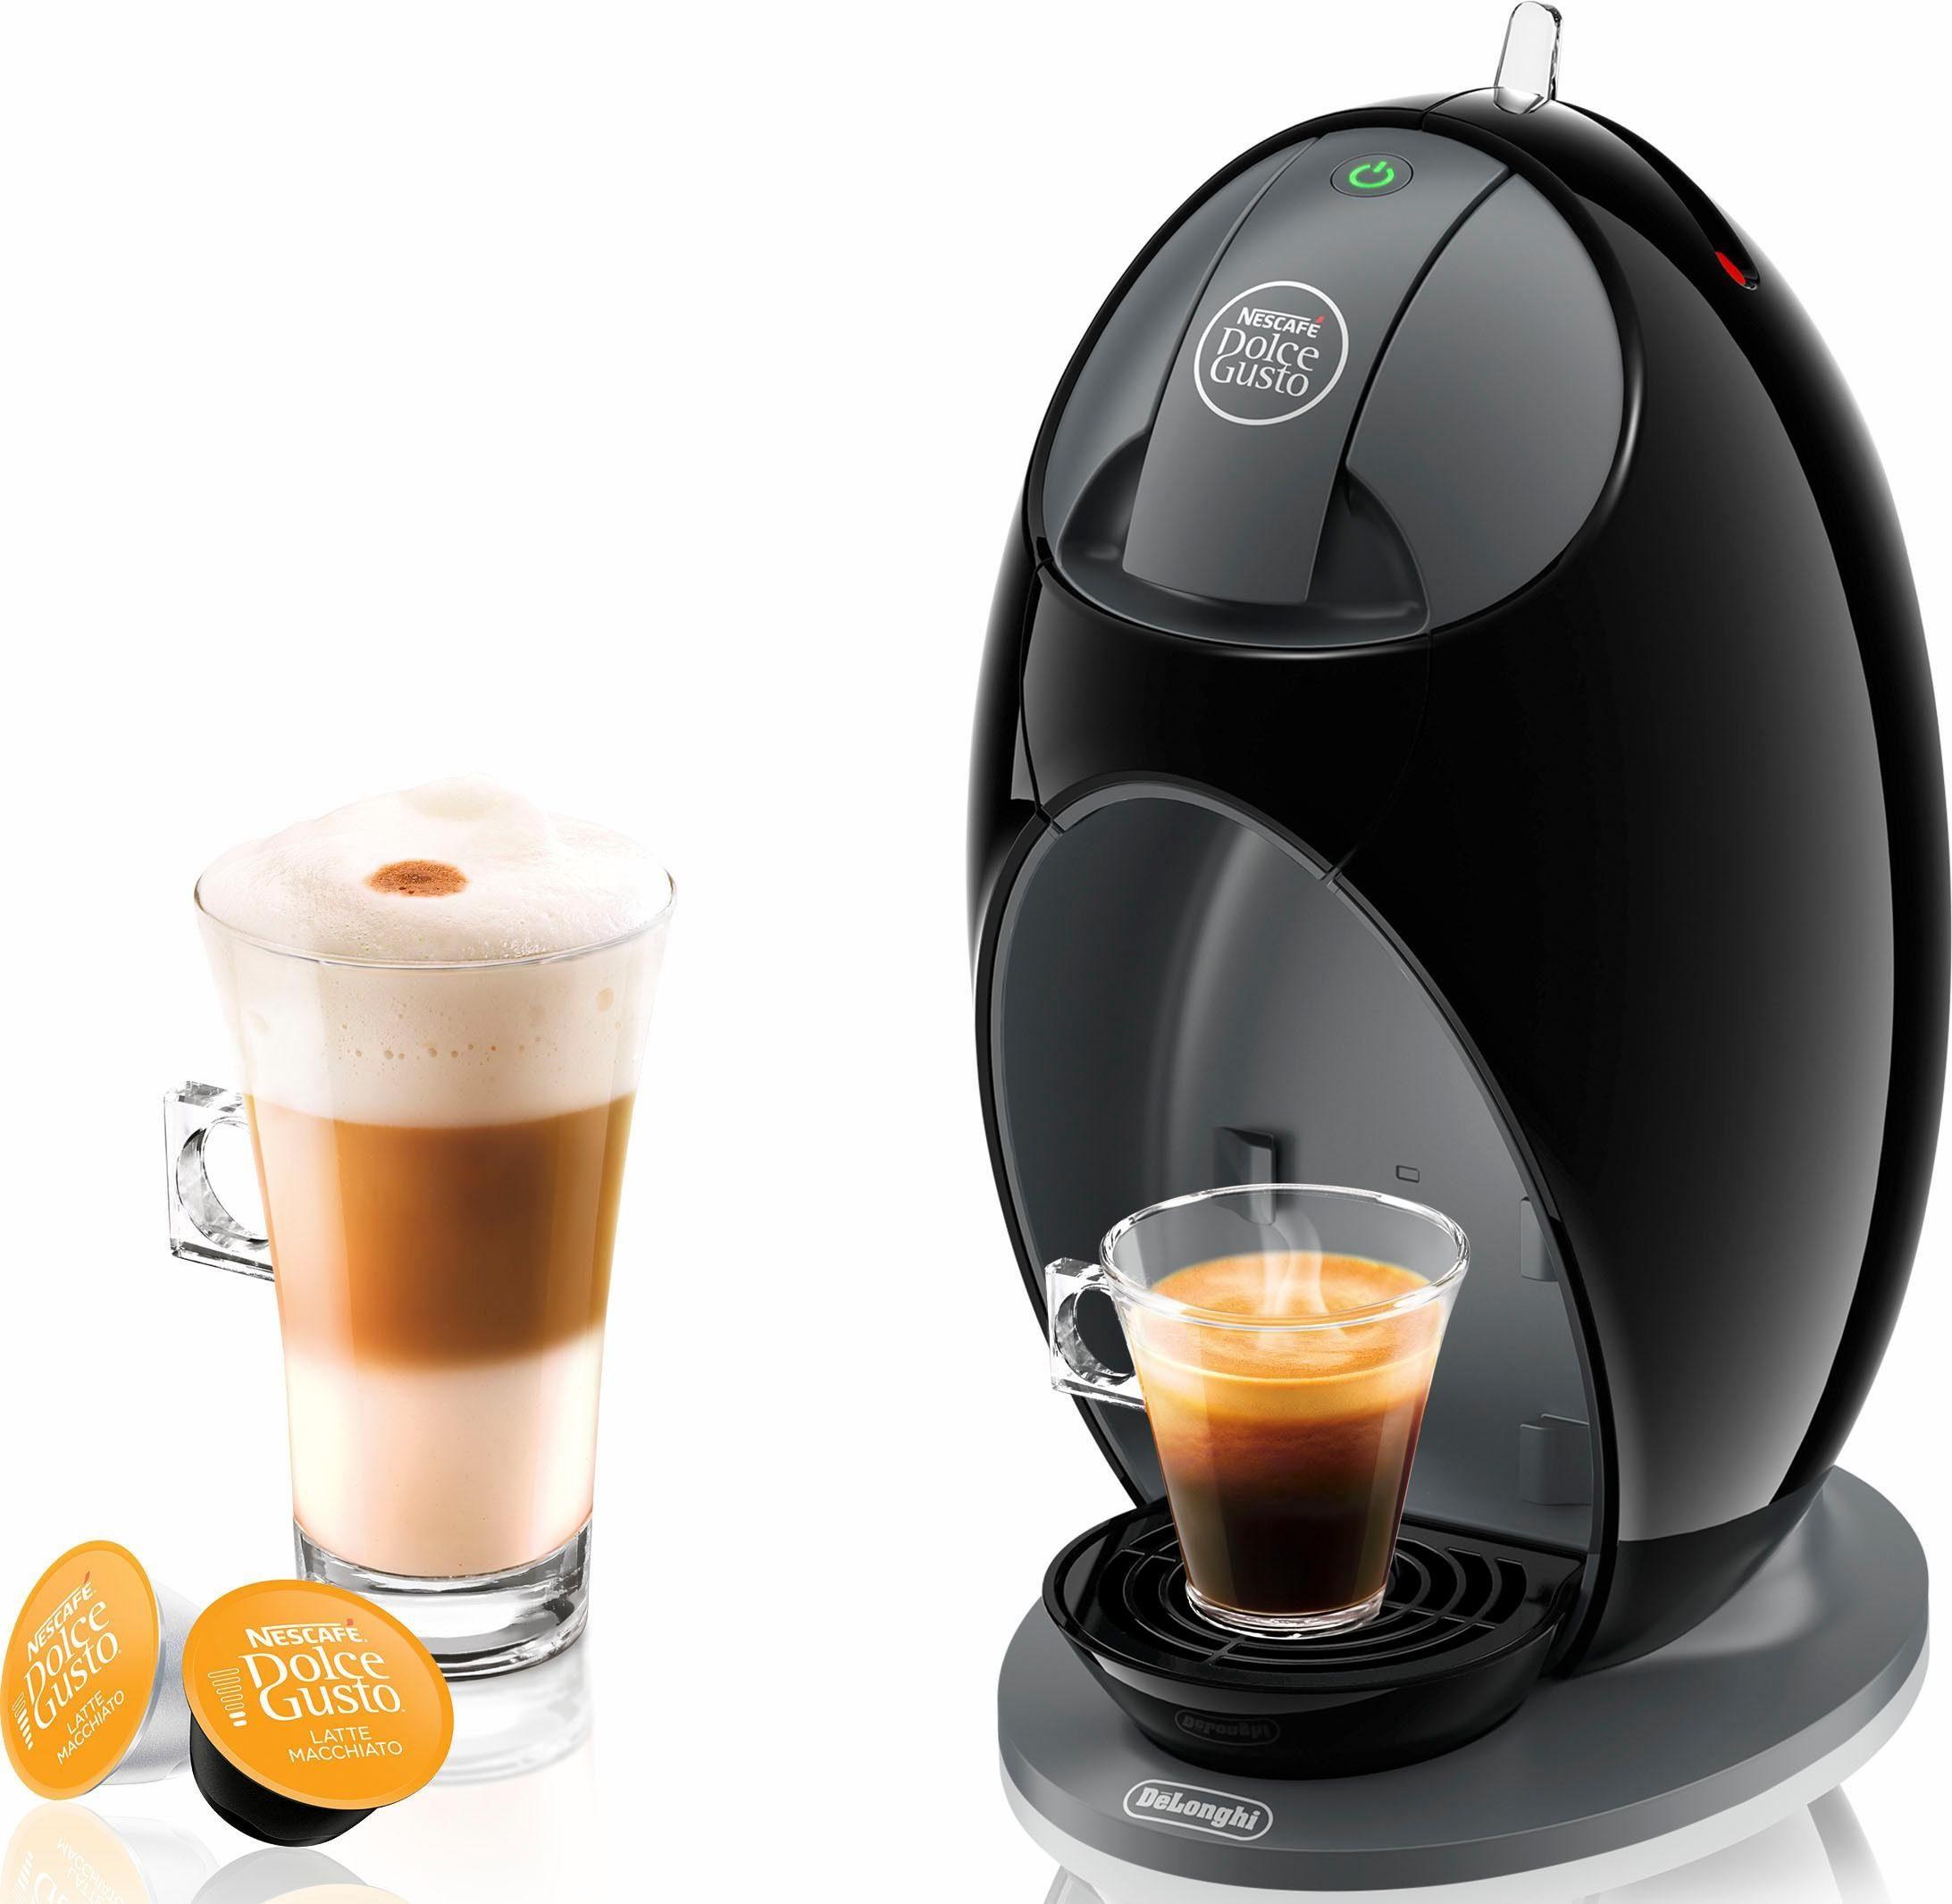 Nescafé Dolce Gusto Kapselmaschine NESCAFÉ® Dolce Gusto® Jovia EDG 250.B, inkl. 40,- Online Gutschein